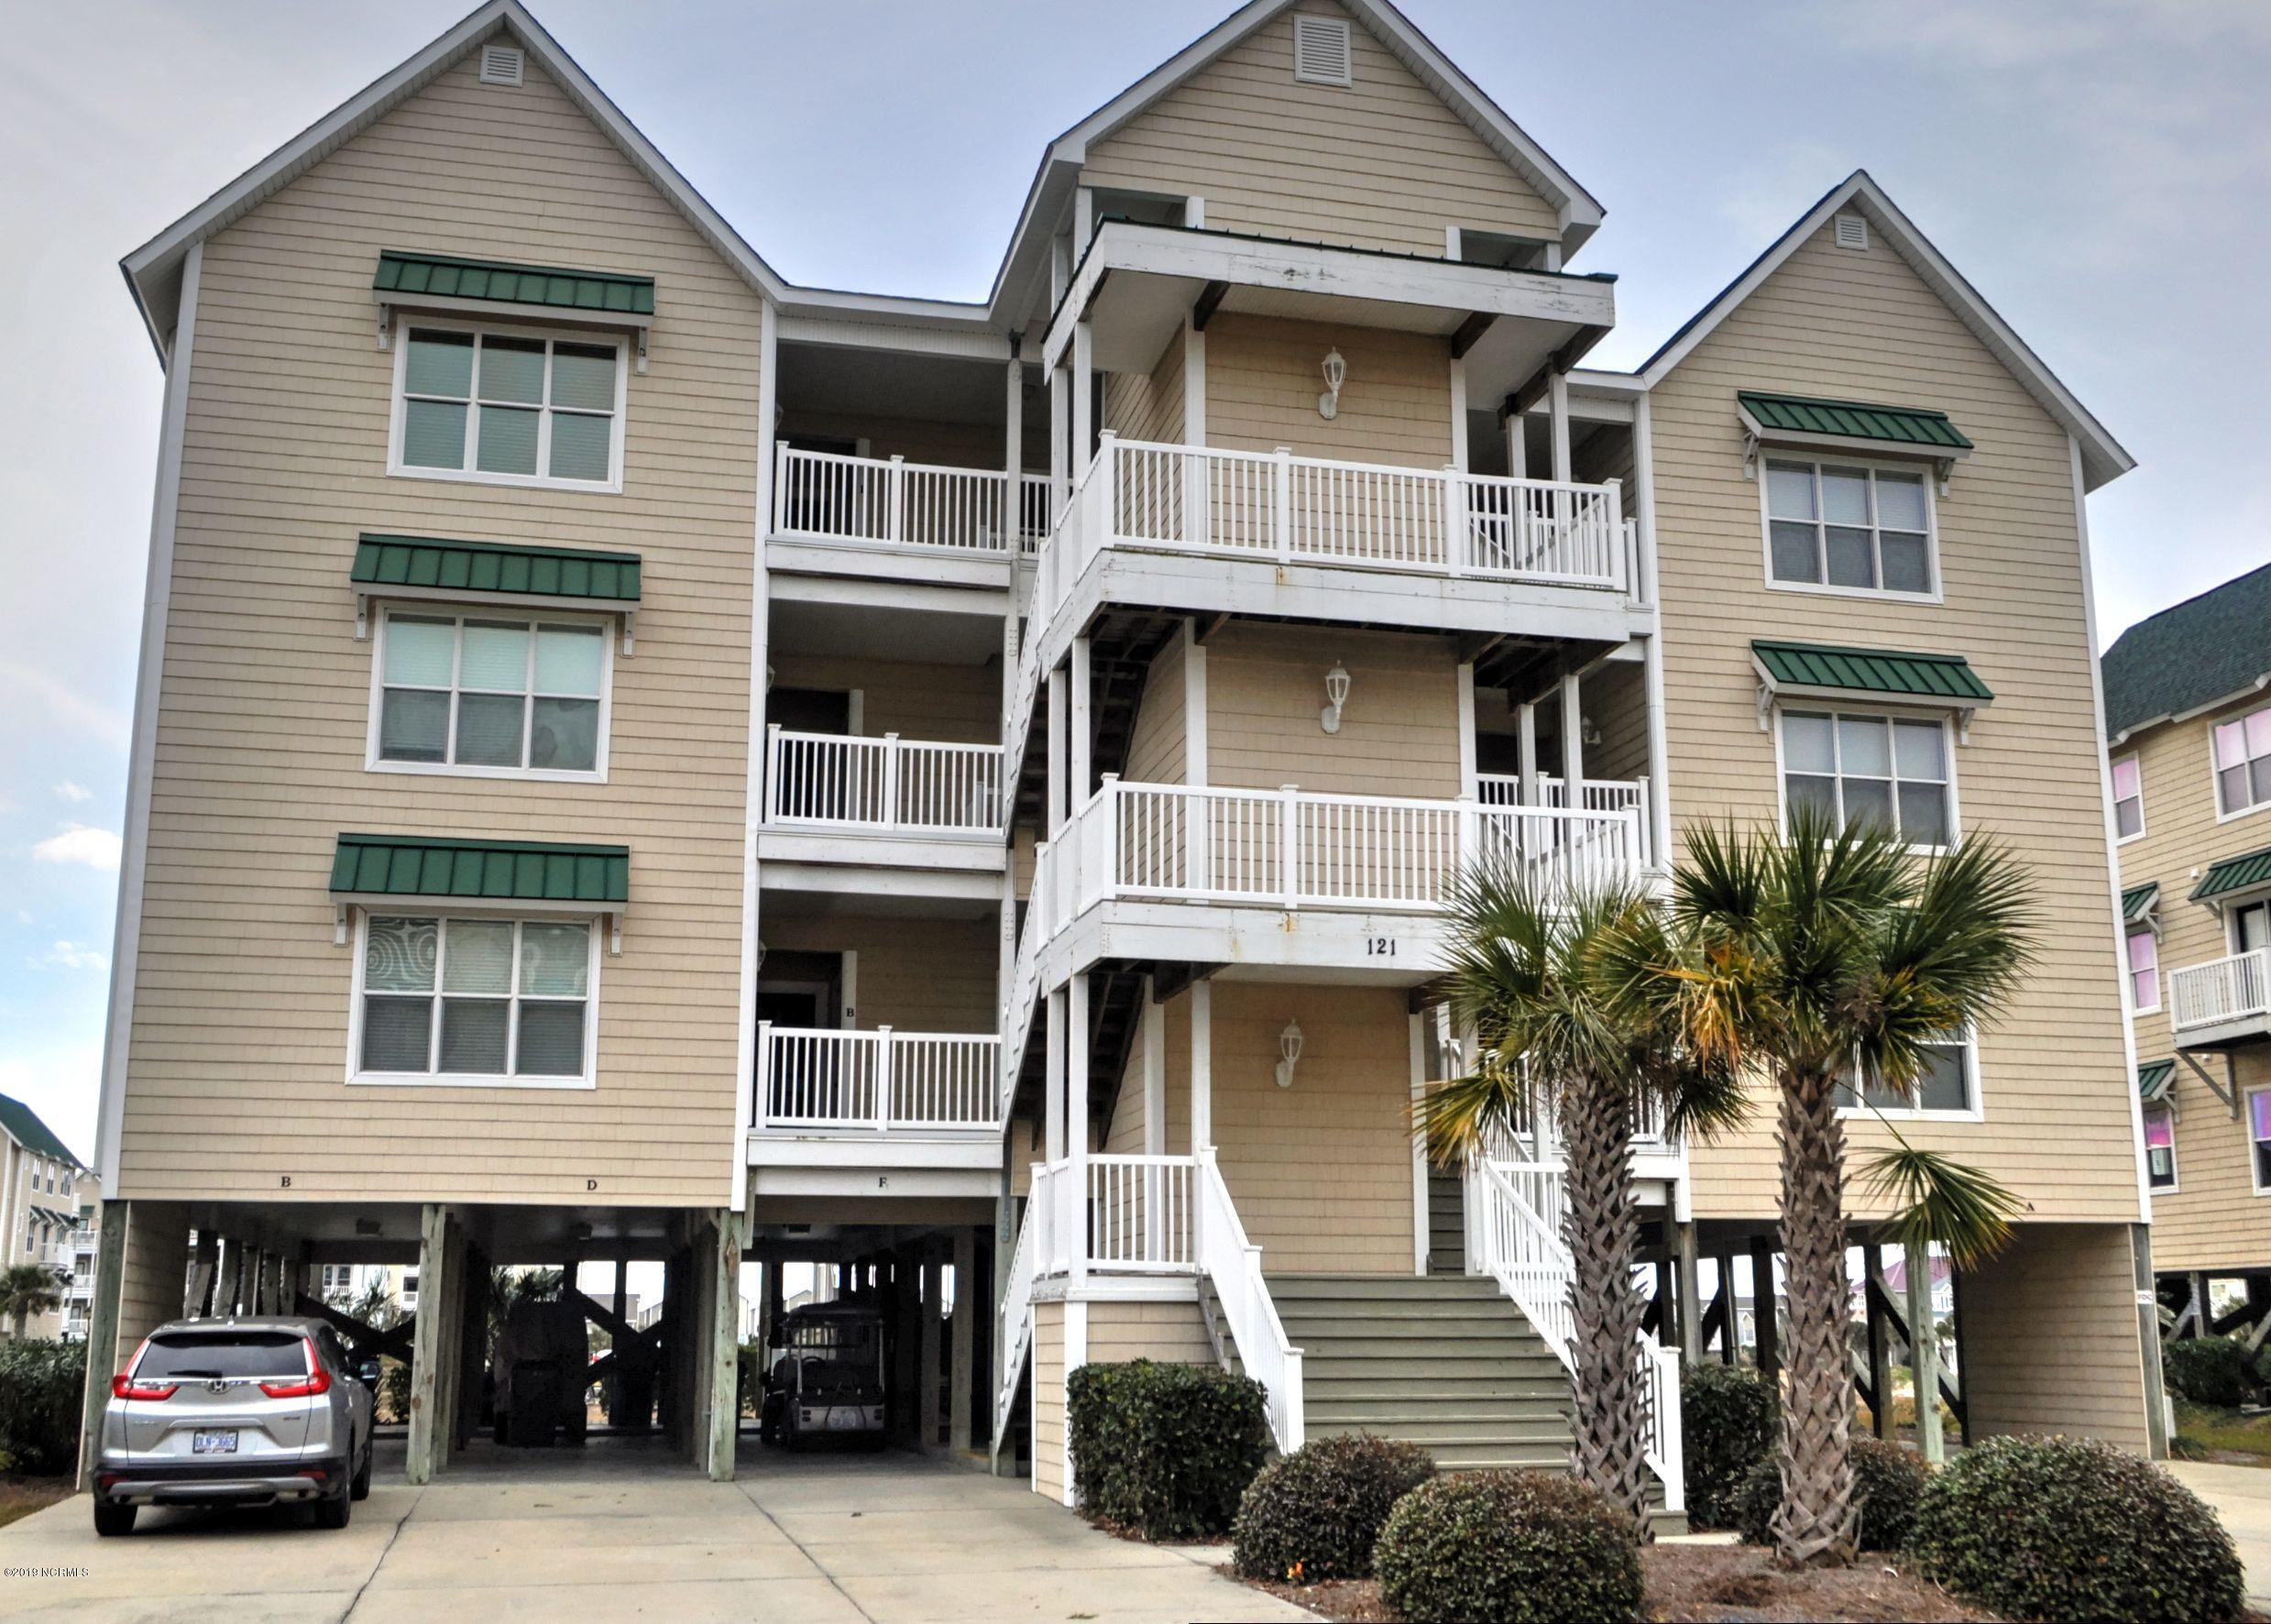 Carolina Plantations Real Estate - MLS Number: 100148636